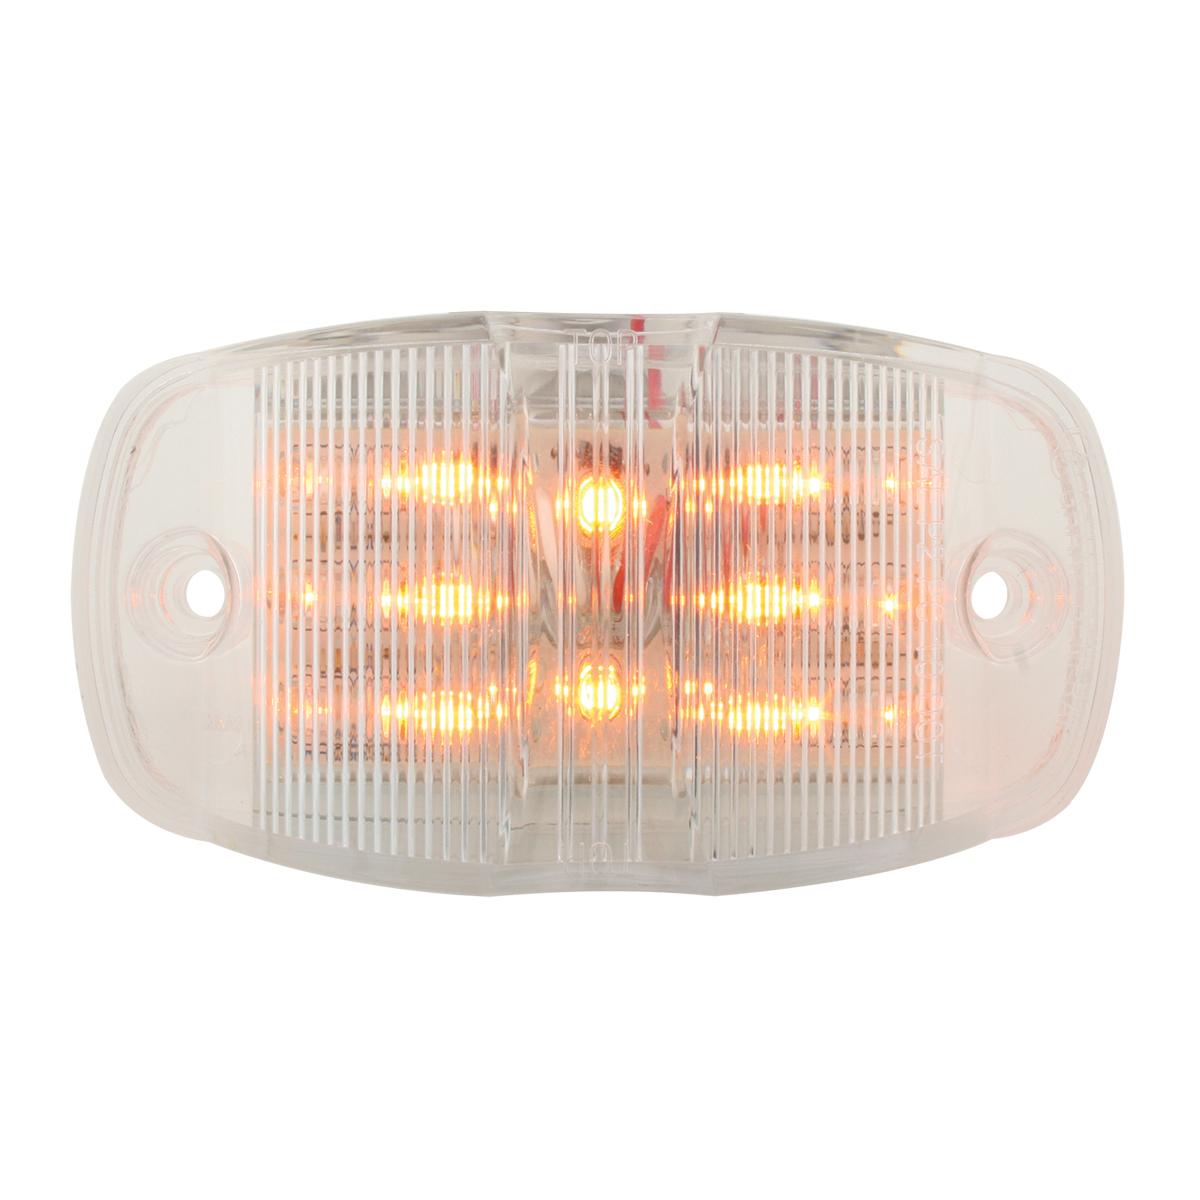 75161 Rectangular Camel Back Wide Angle Dual Function LED Light